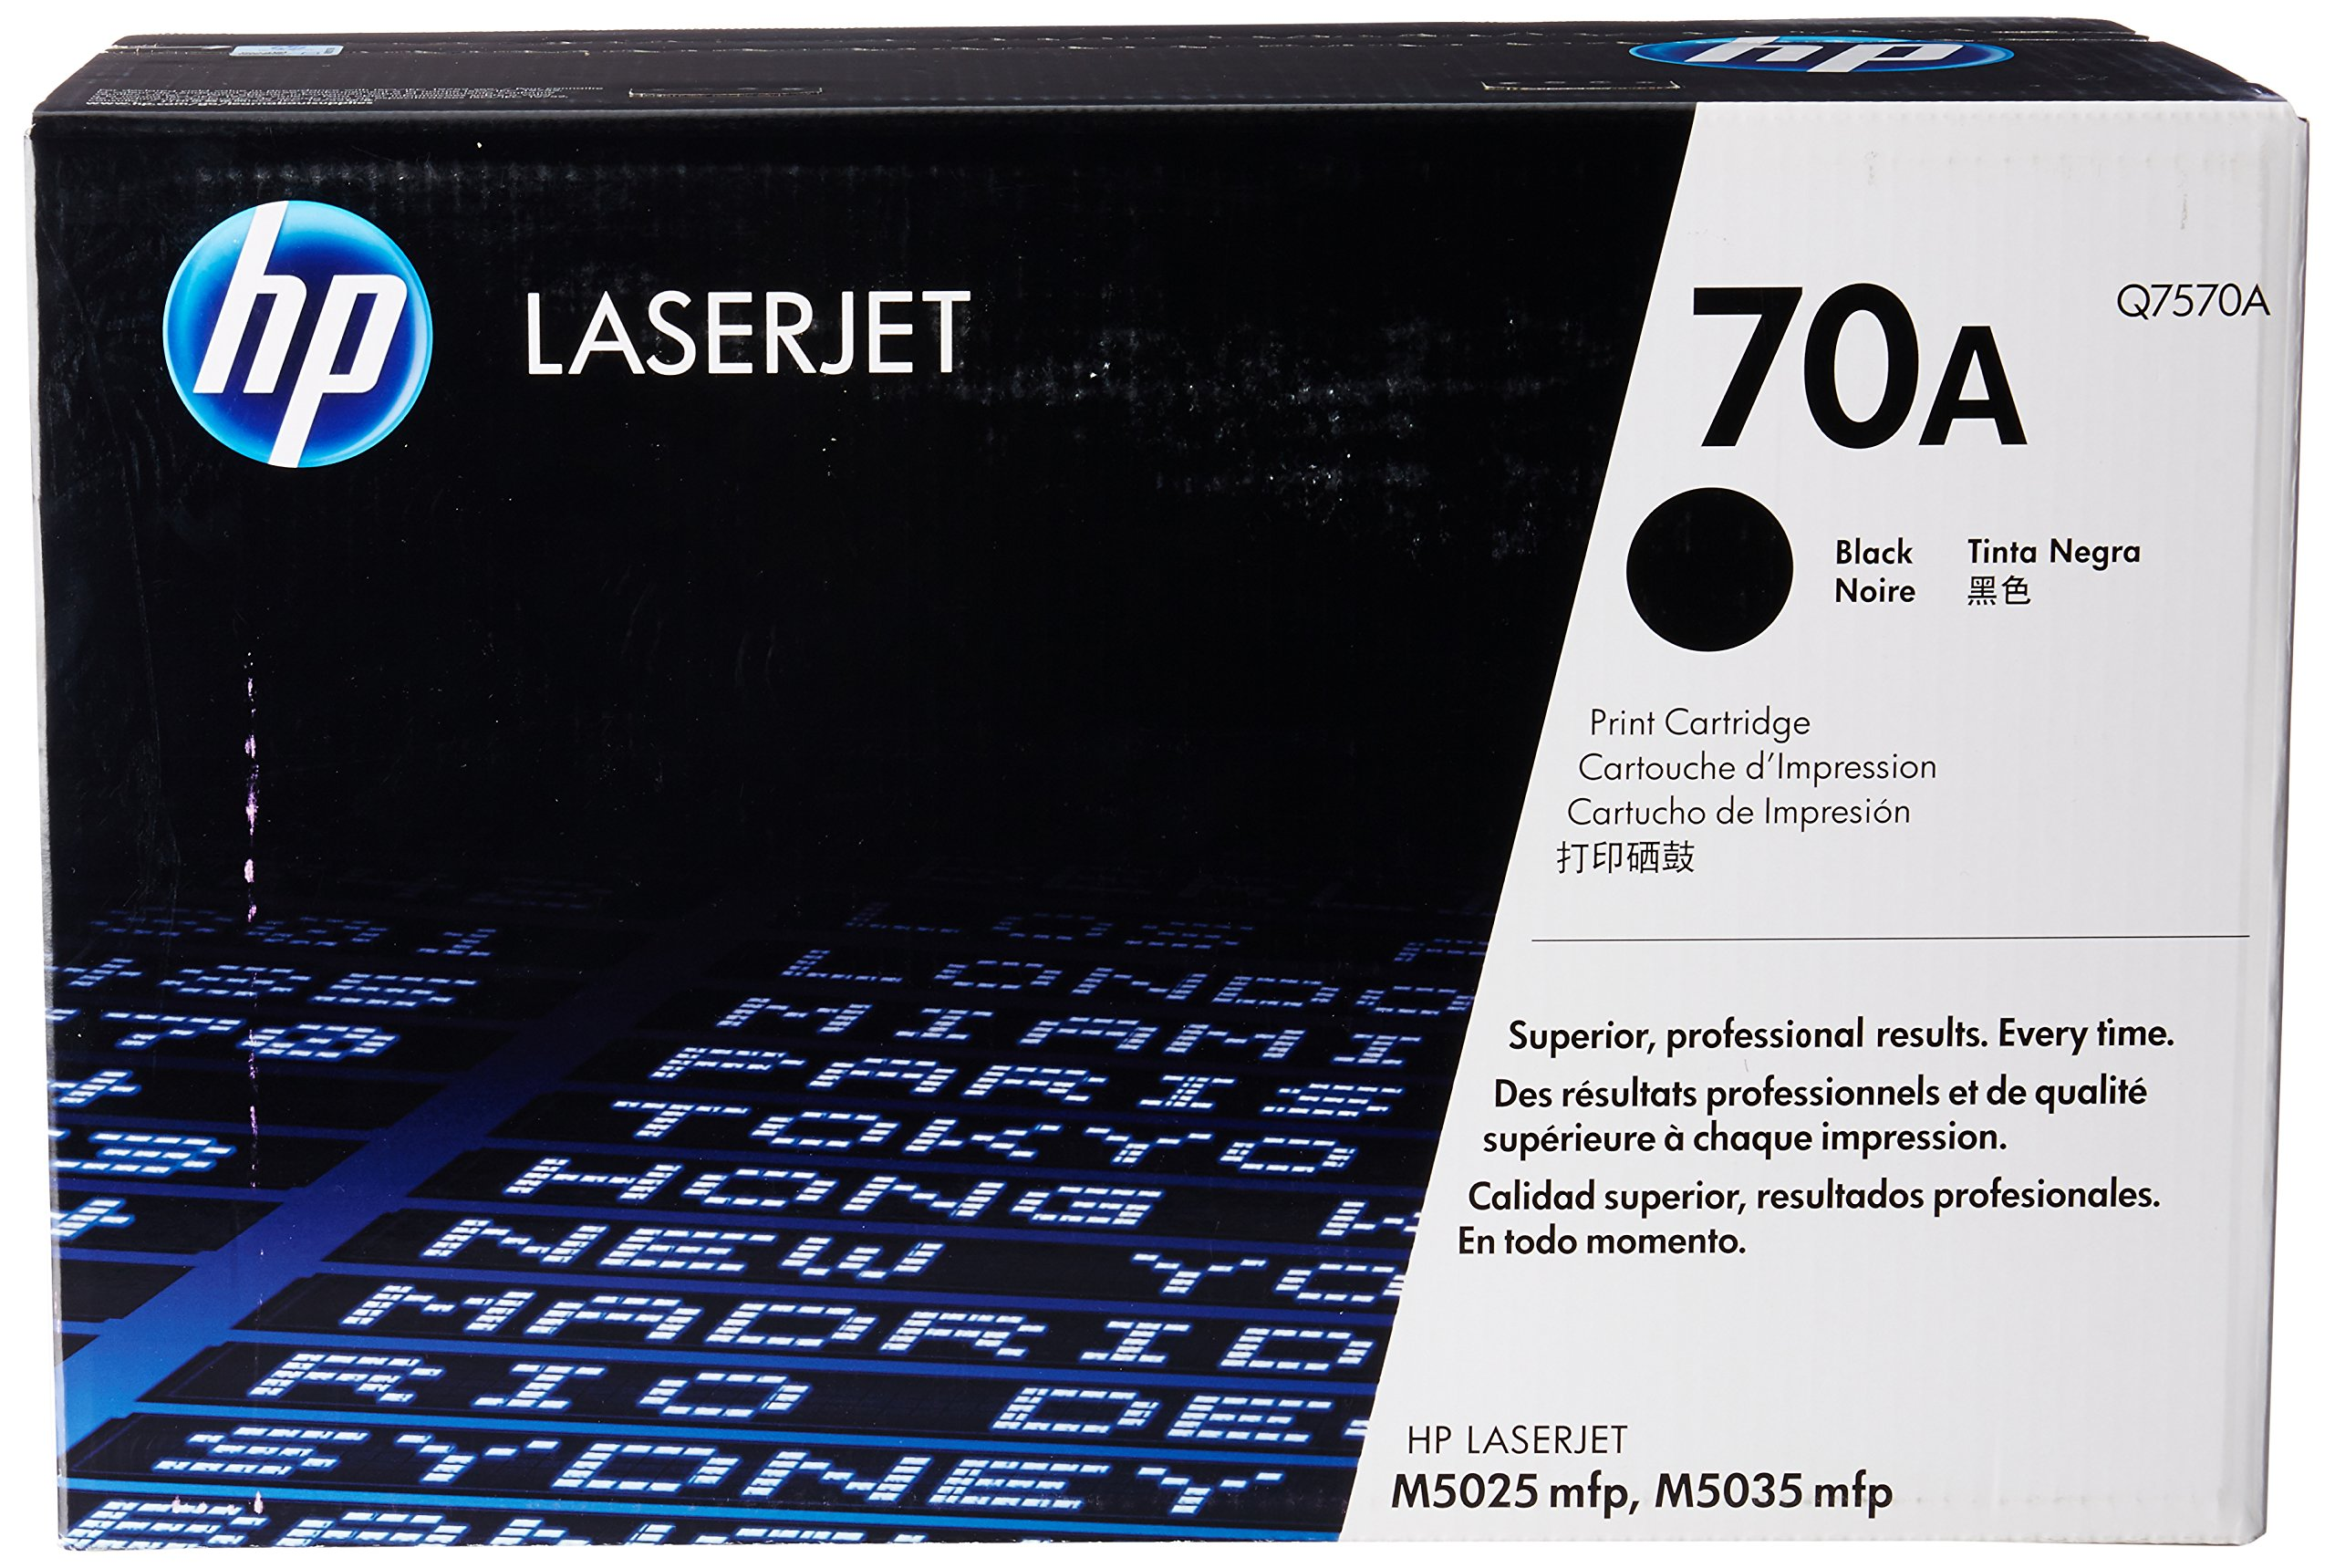 HP-70A-Q7570A-Schwarz-Original-Toner-fr-HP-Laserjet-M5025-HP-Laserjet-M5035